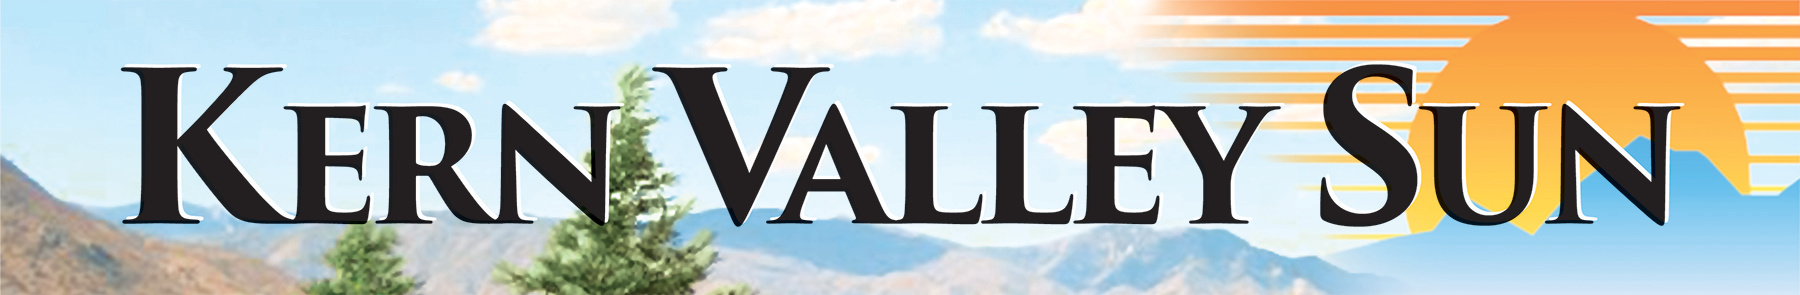 Kern Valley Sun Newspaper